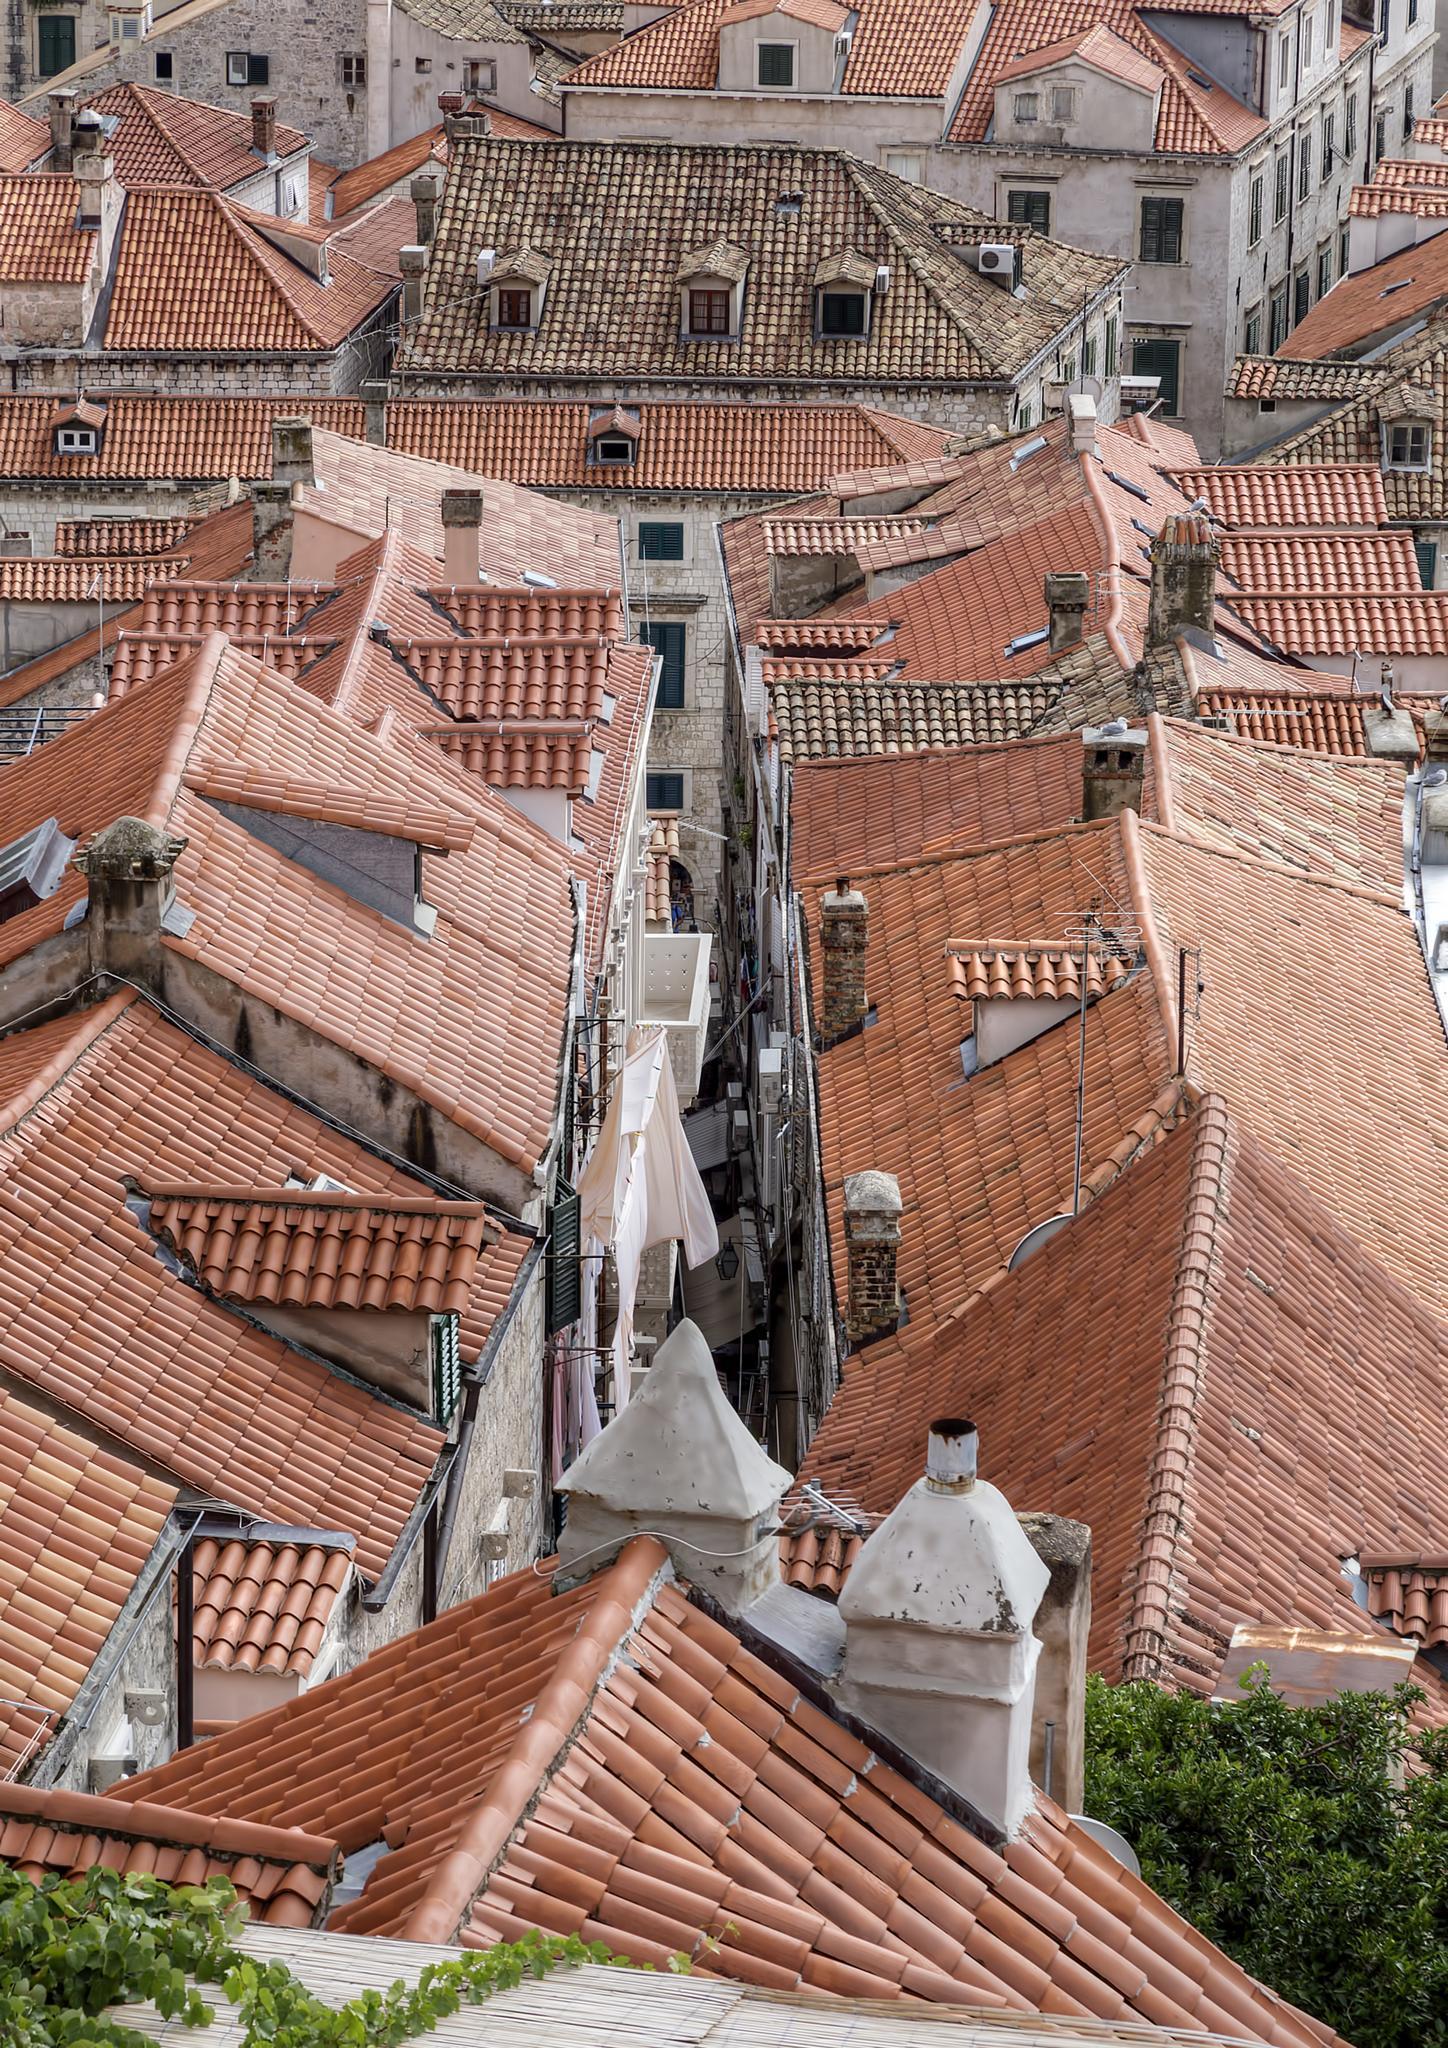 Rooftops by Peter Ellison